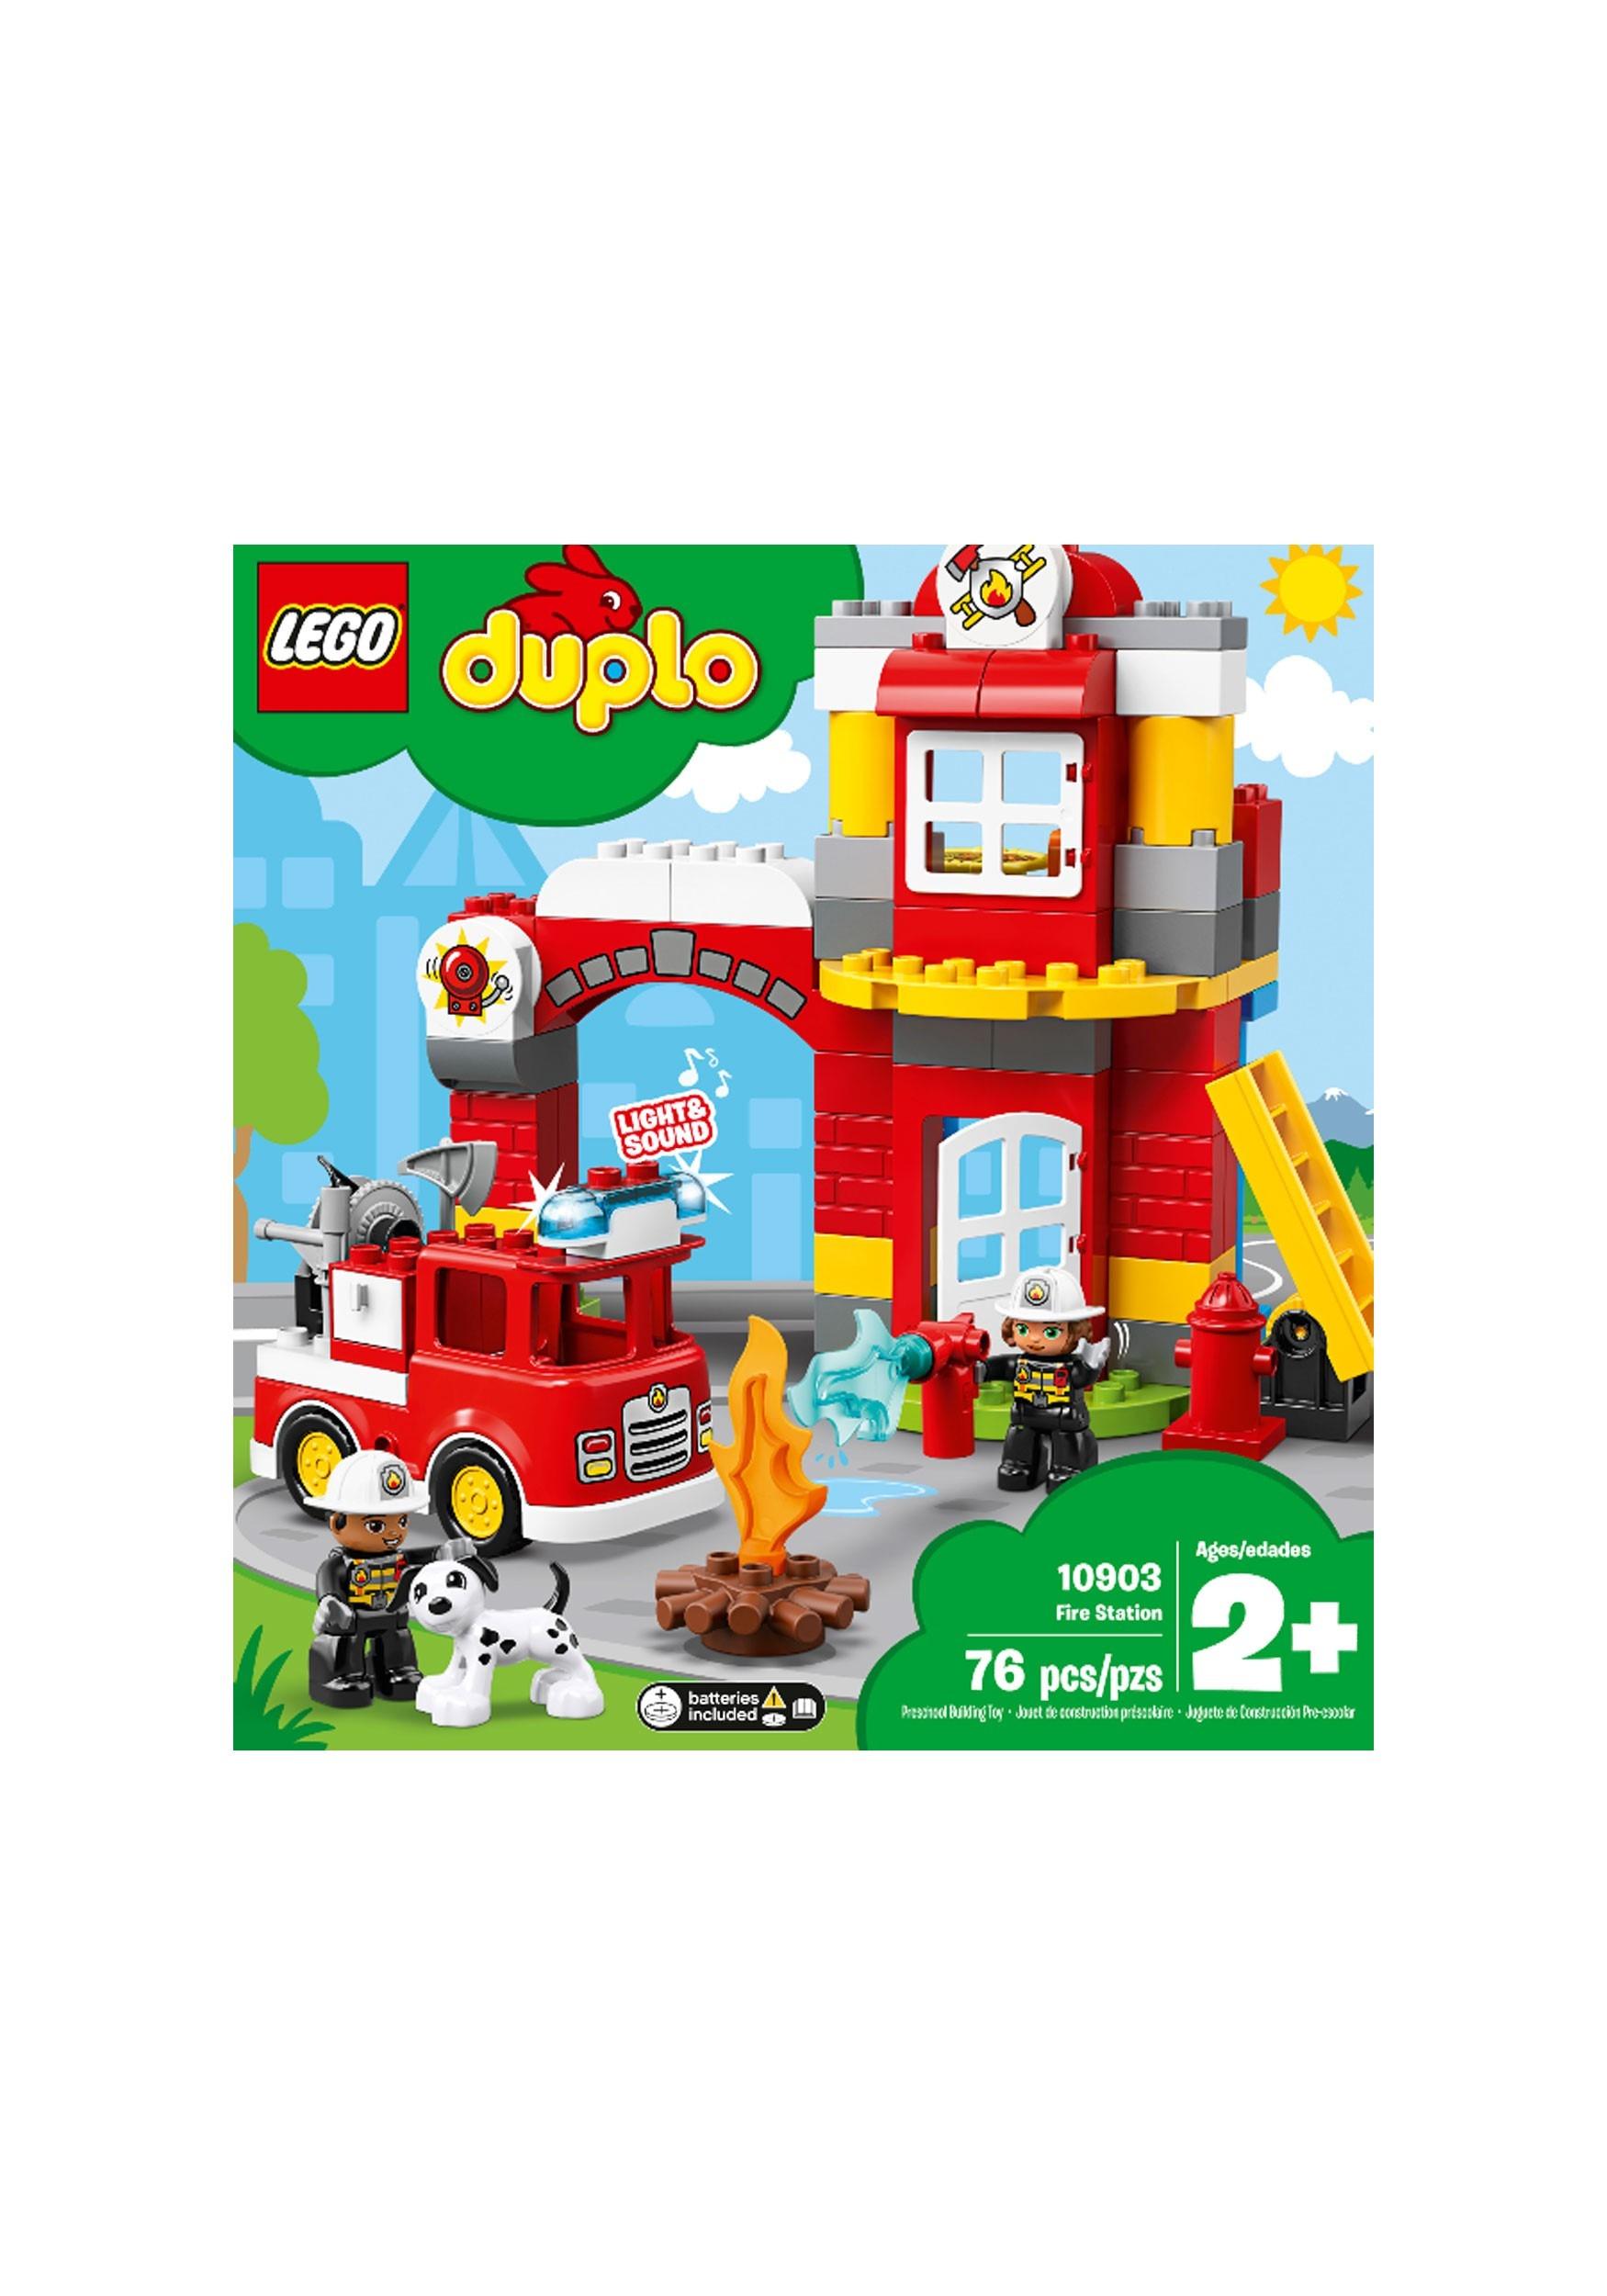 DUPLO LEGO Fire Station